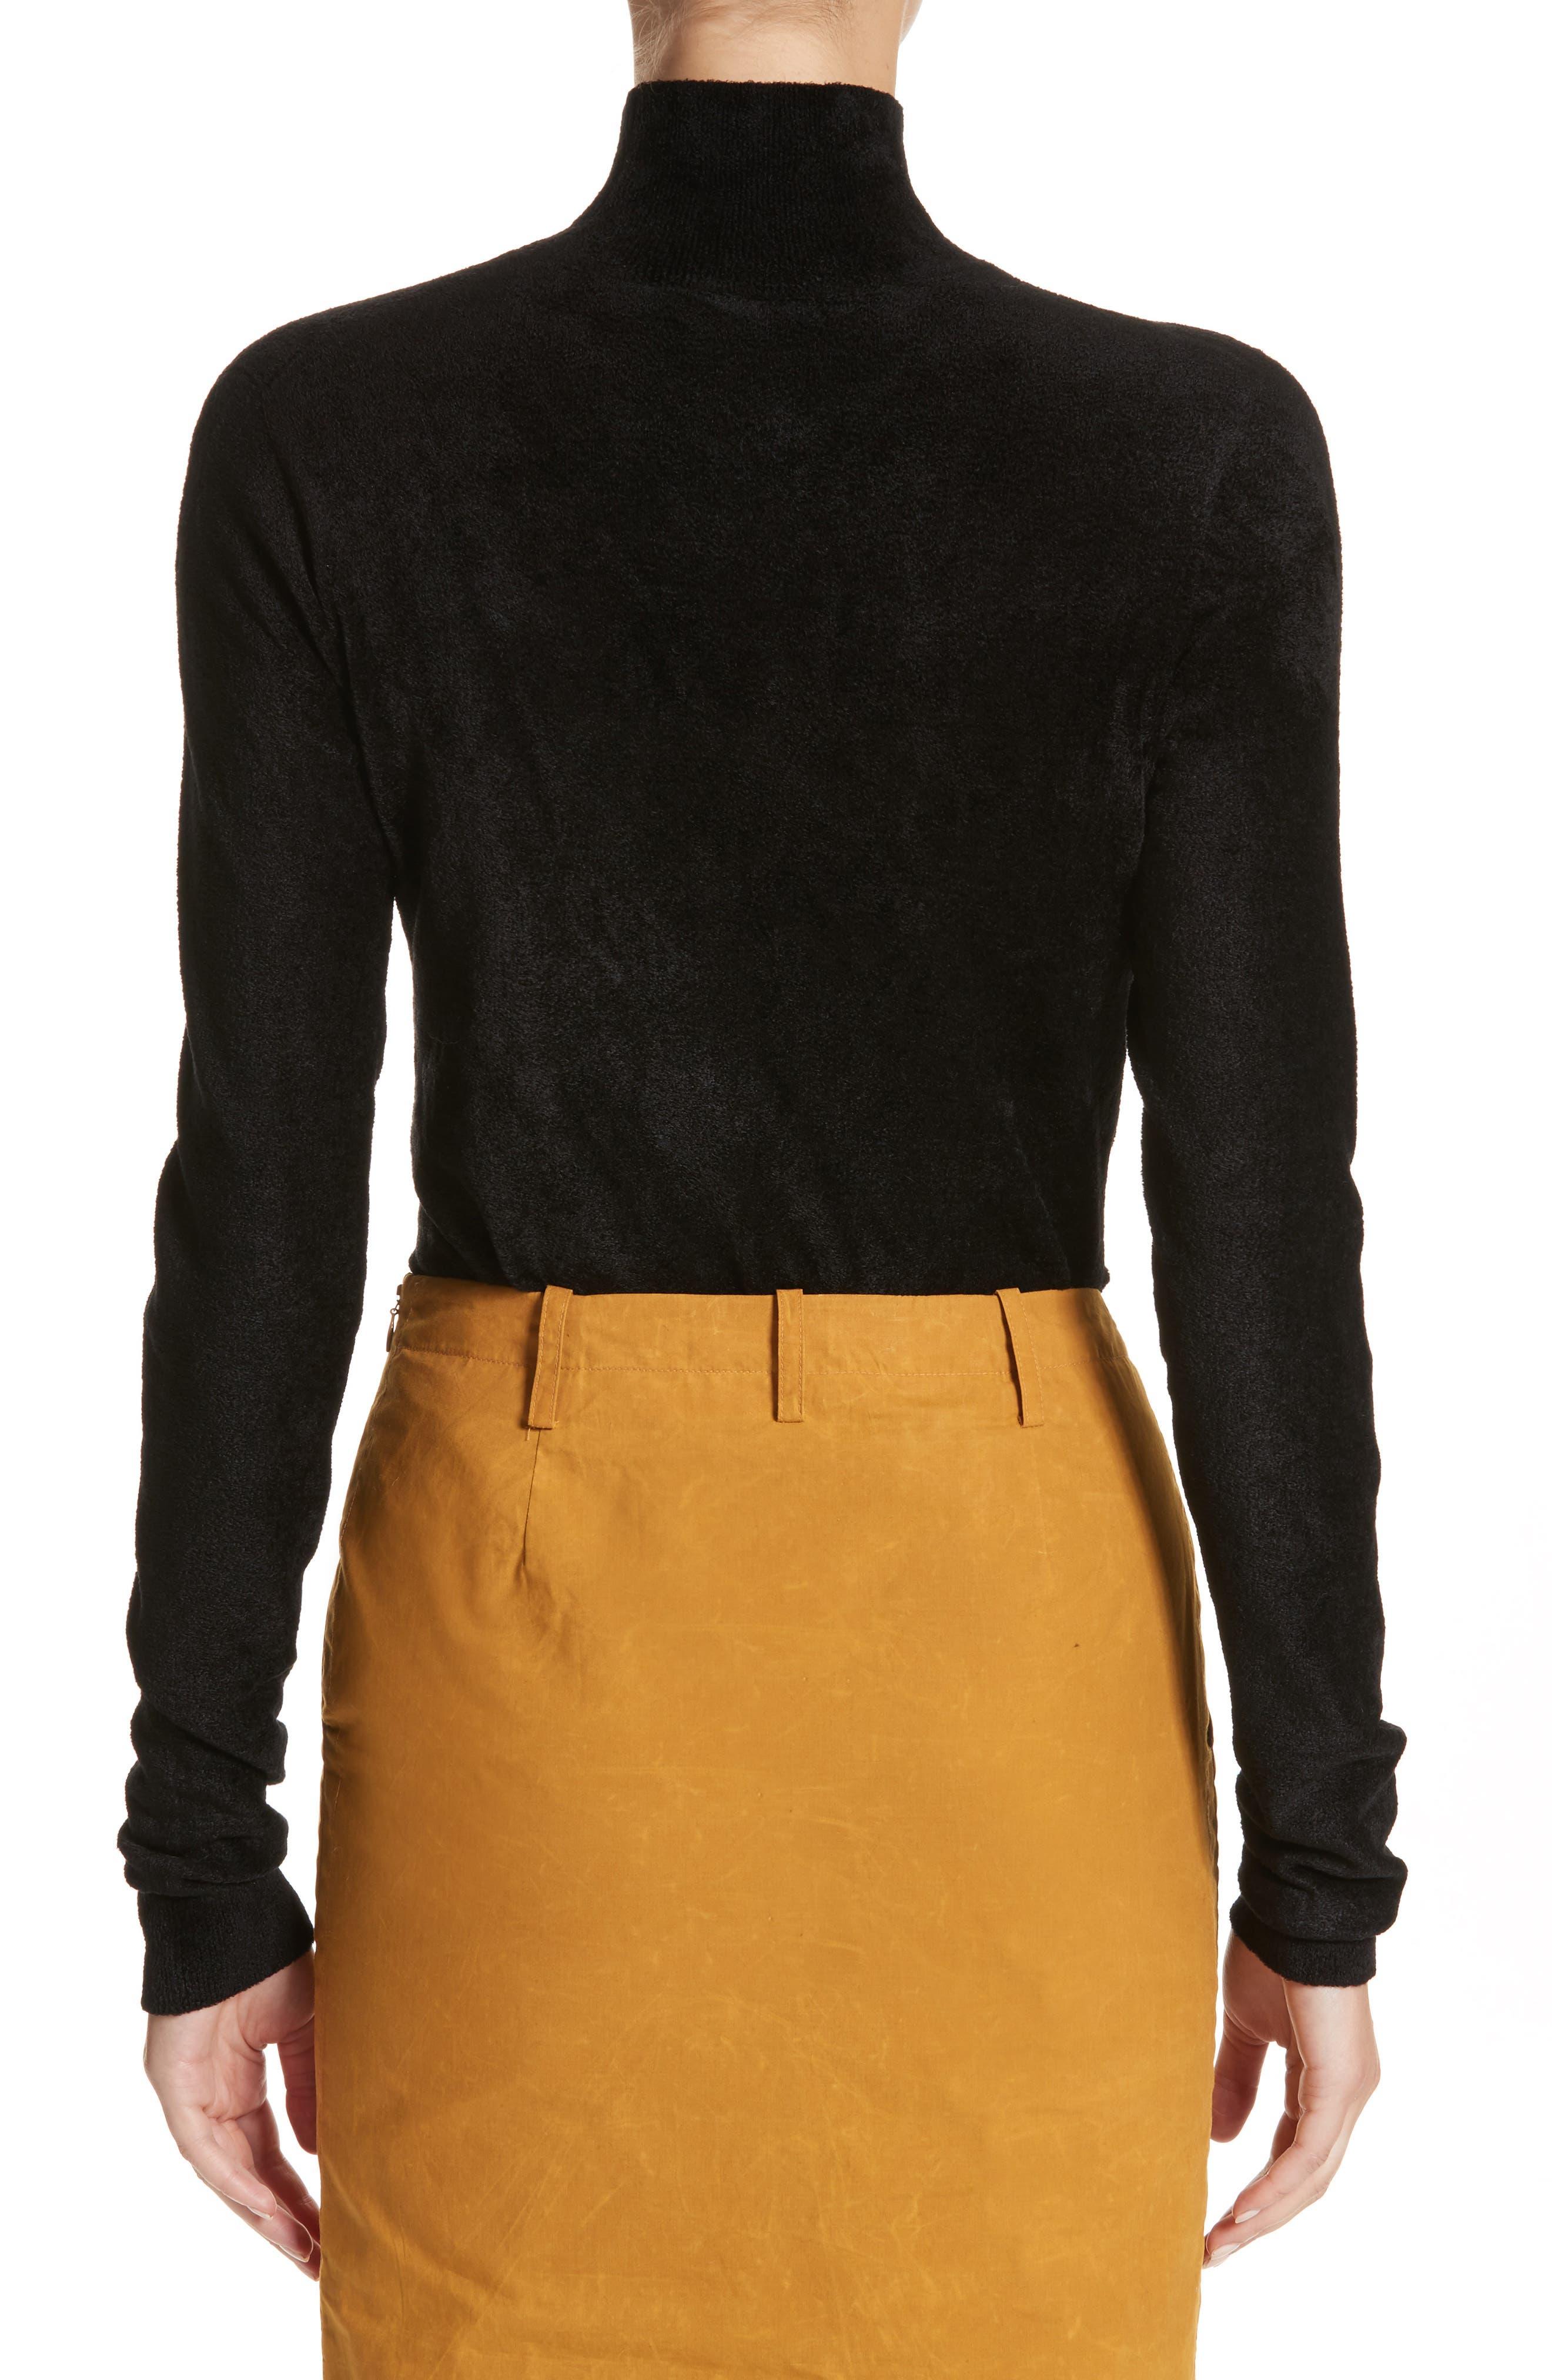 Chenille Turtleneck Sweater,                             Alternate thumbnail 2, color,                             00N99 Black